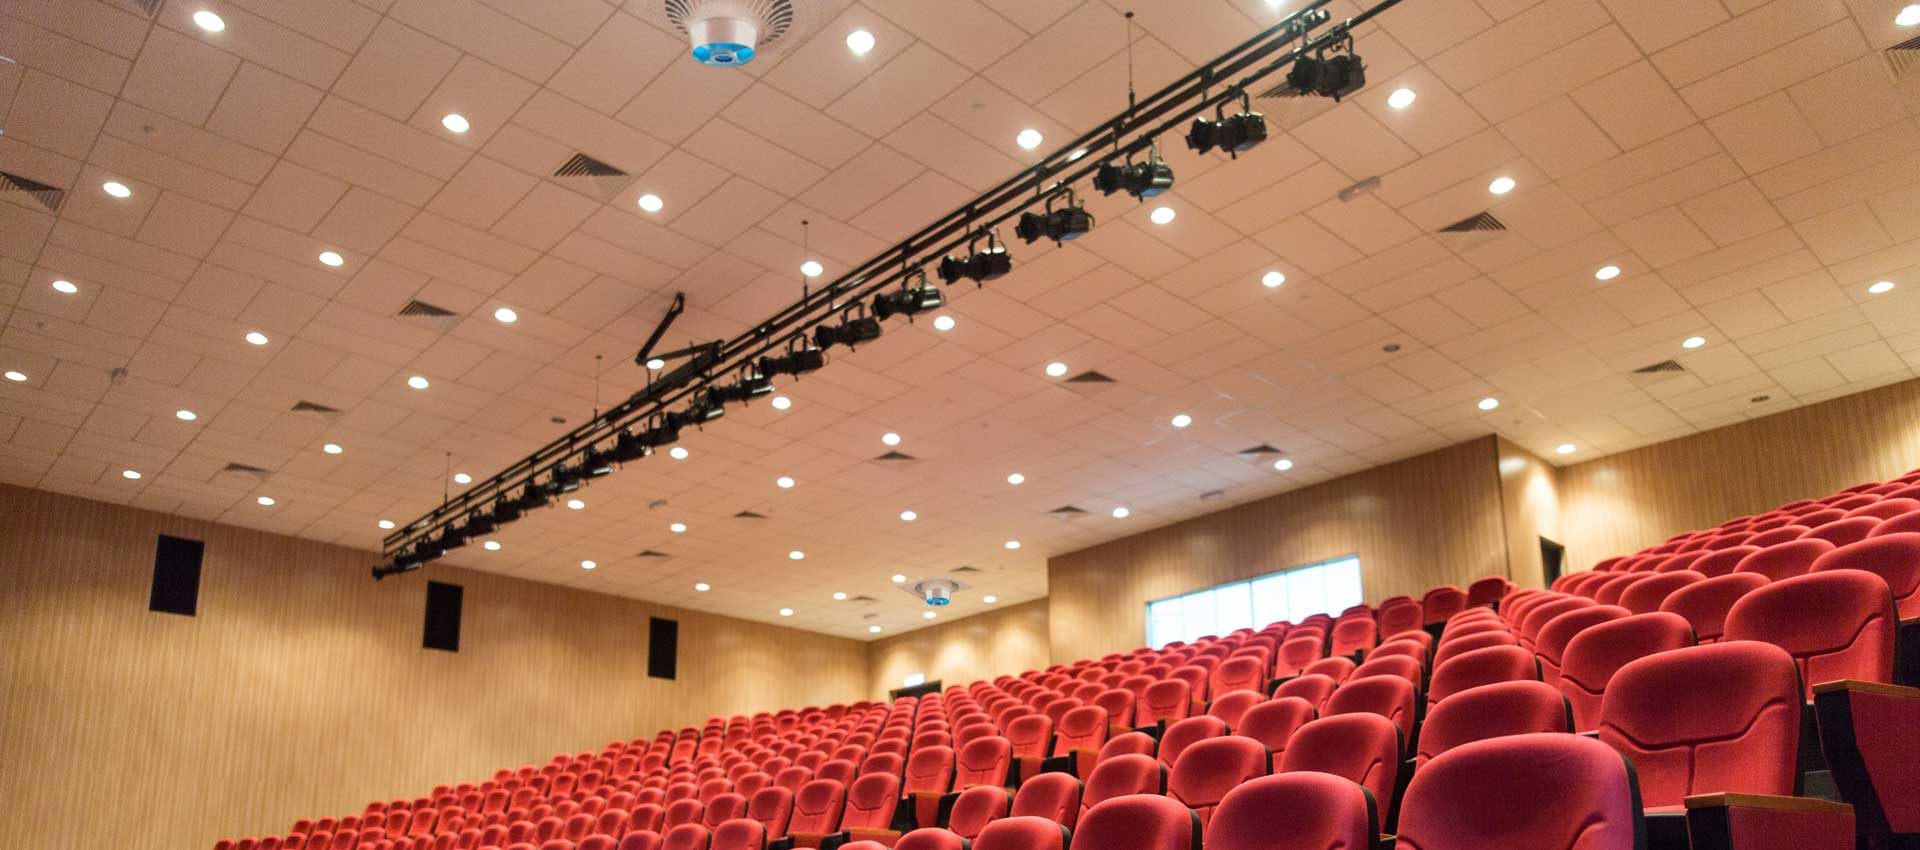 Airius PureAir PHI Air Purification System Installed In a Cinema Theatre